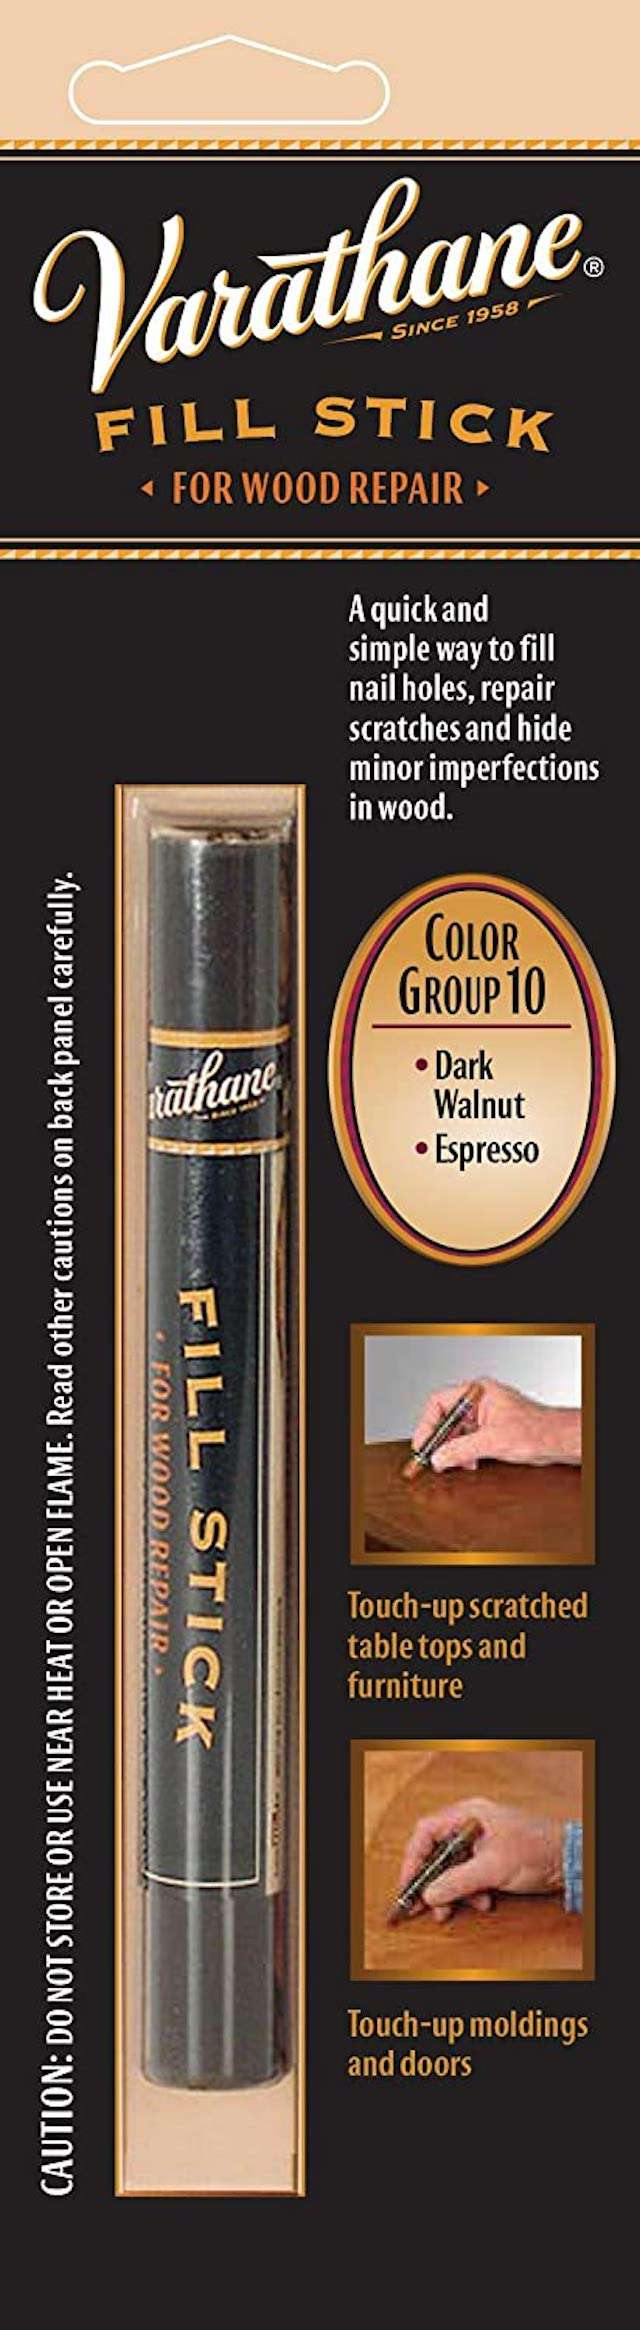 Rust-Oleum Varathane Fill Stick for Wood Repair